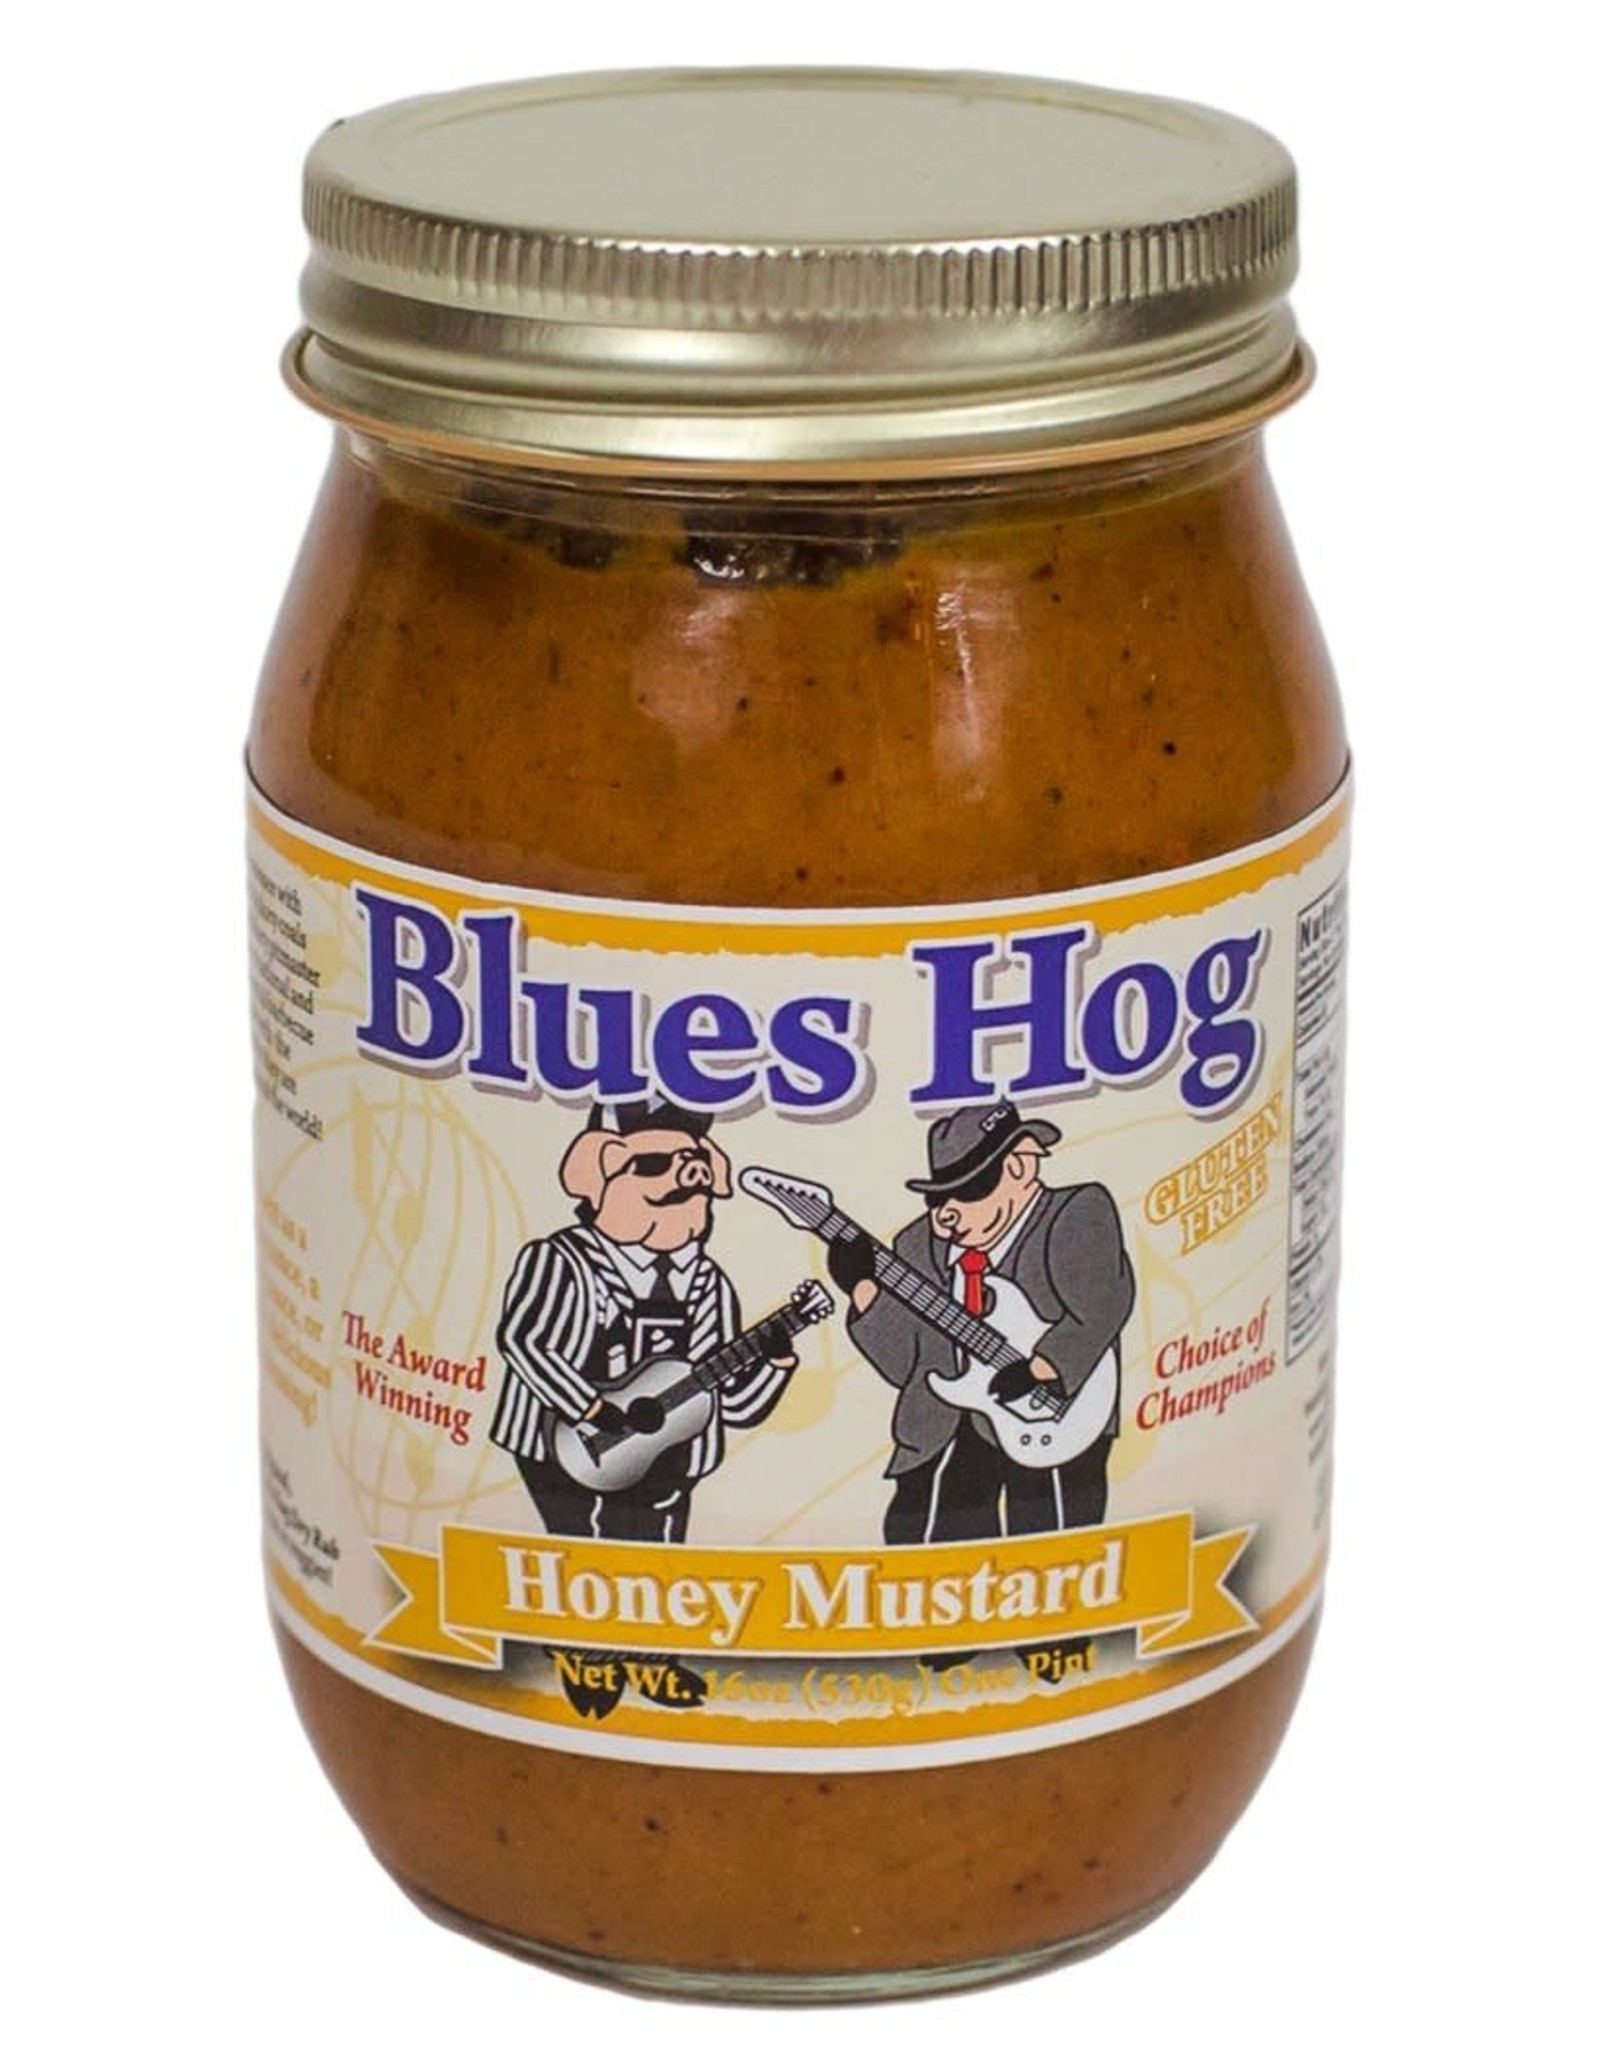 BLUES HOG BLUES HOG HONEY MUSTARD 16 OZ.